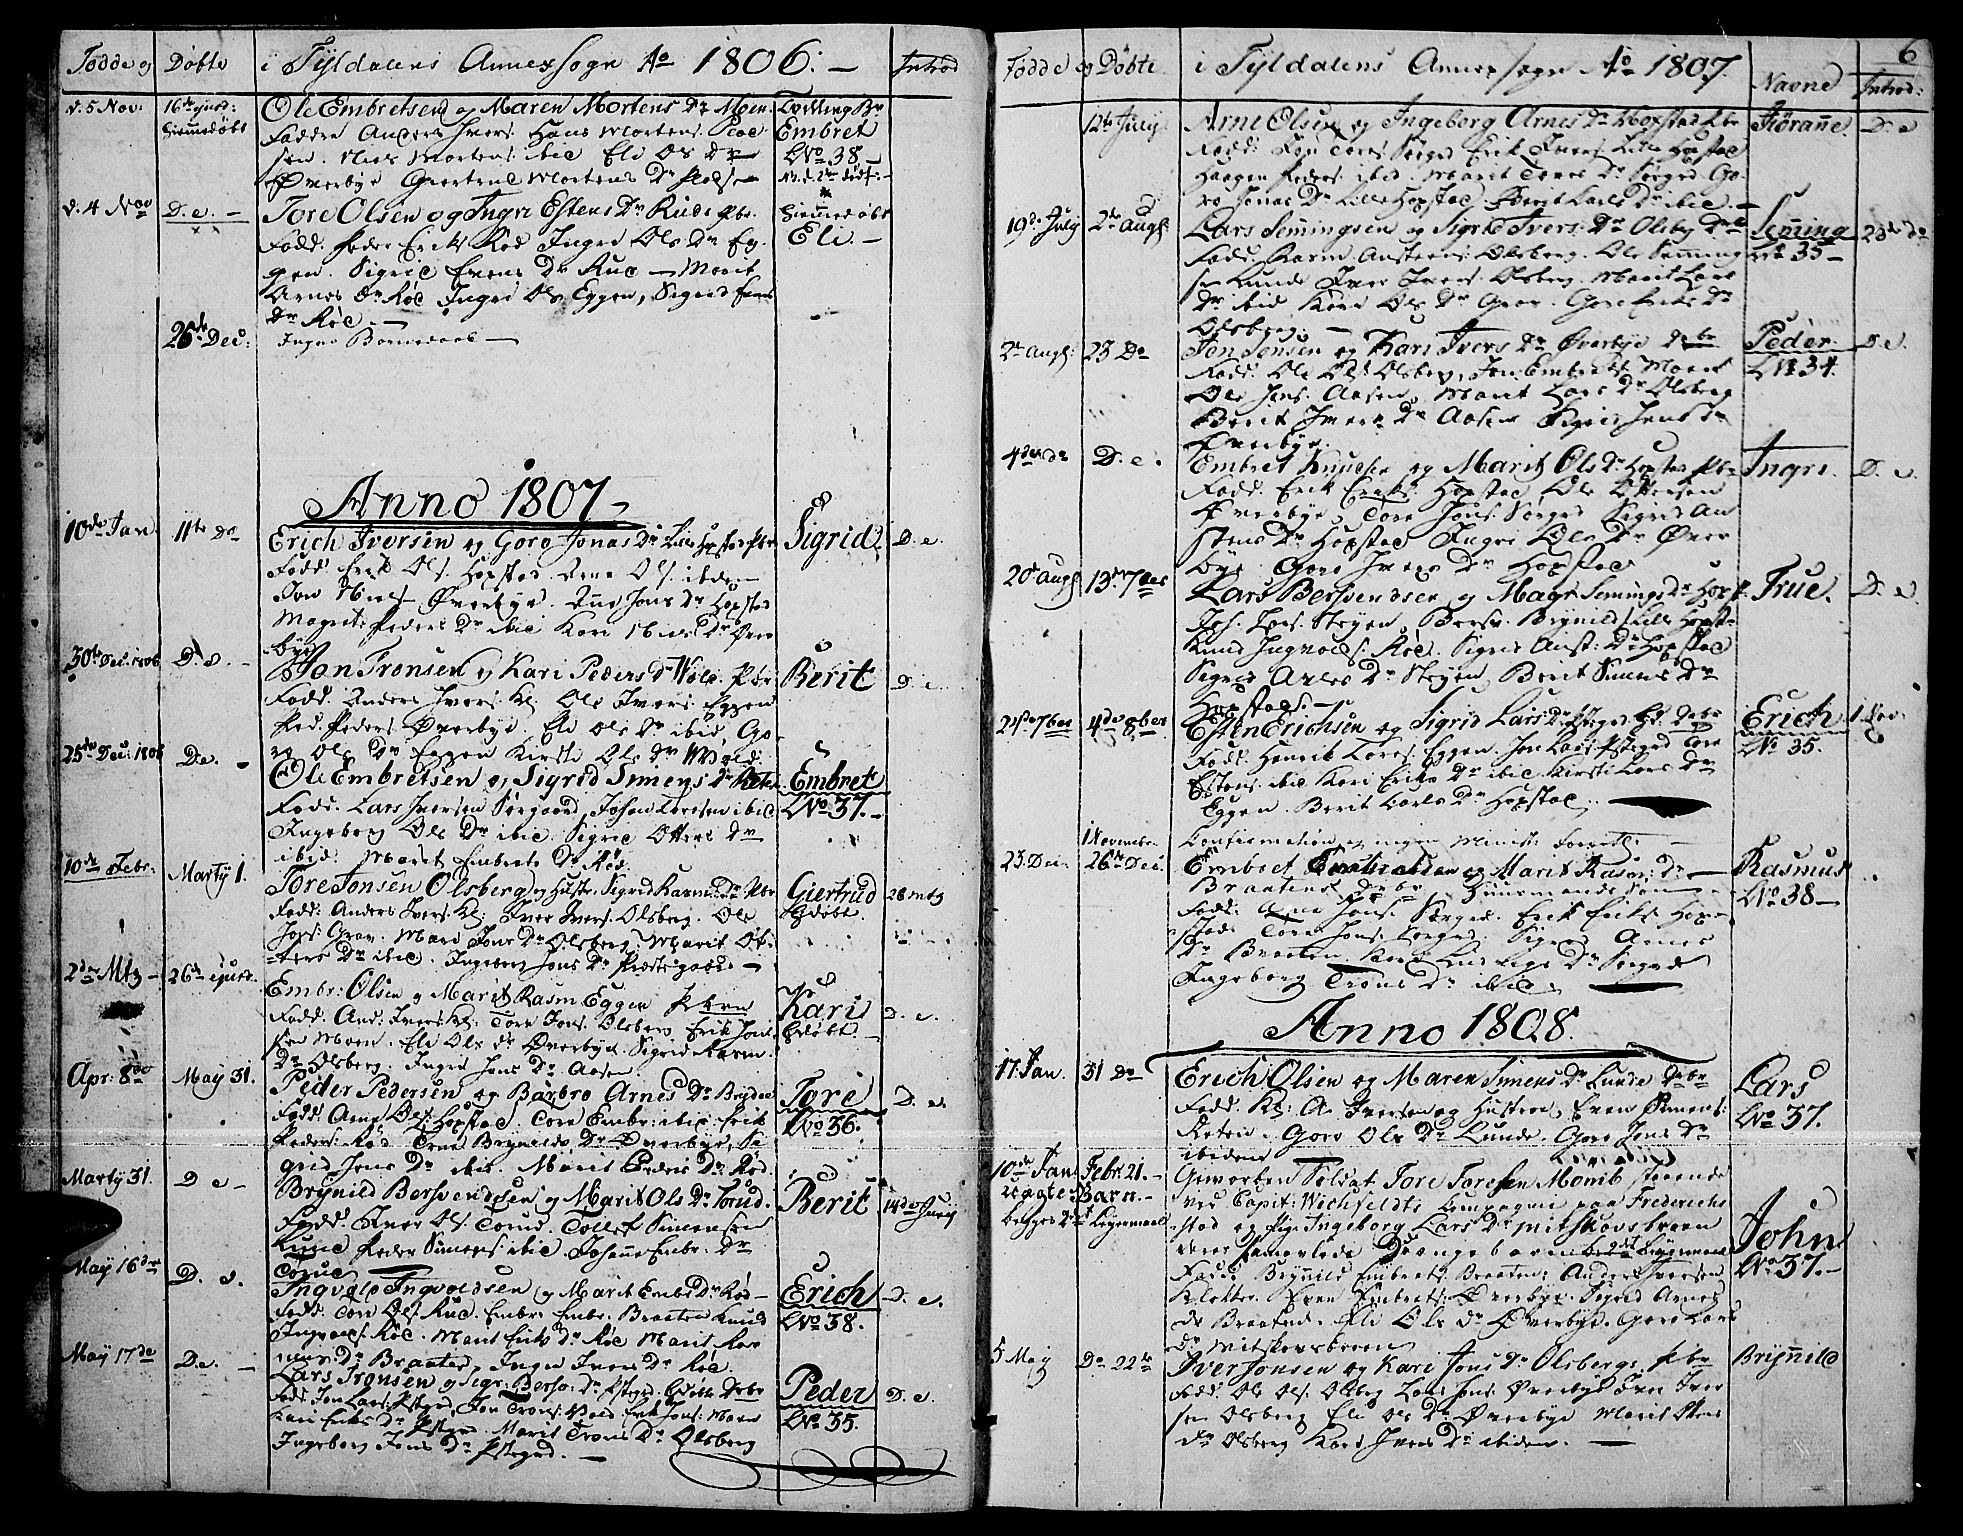 SAH, Tynset prestekontor, Ministerialbok nr. 17, 1801-1814, s. 6